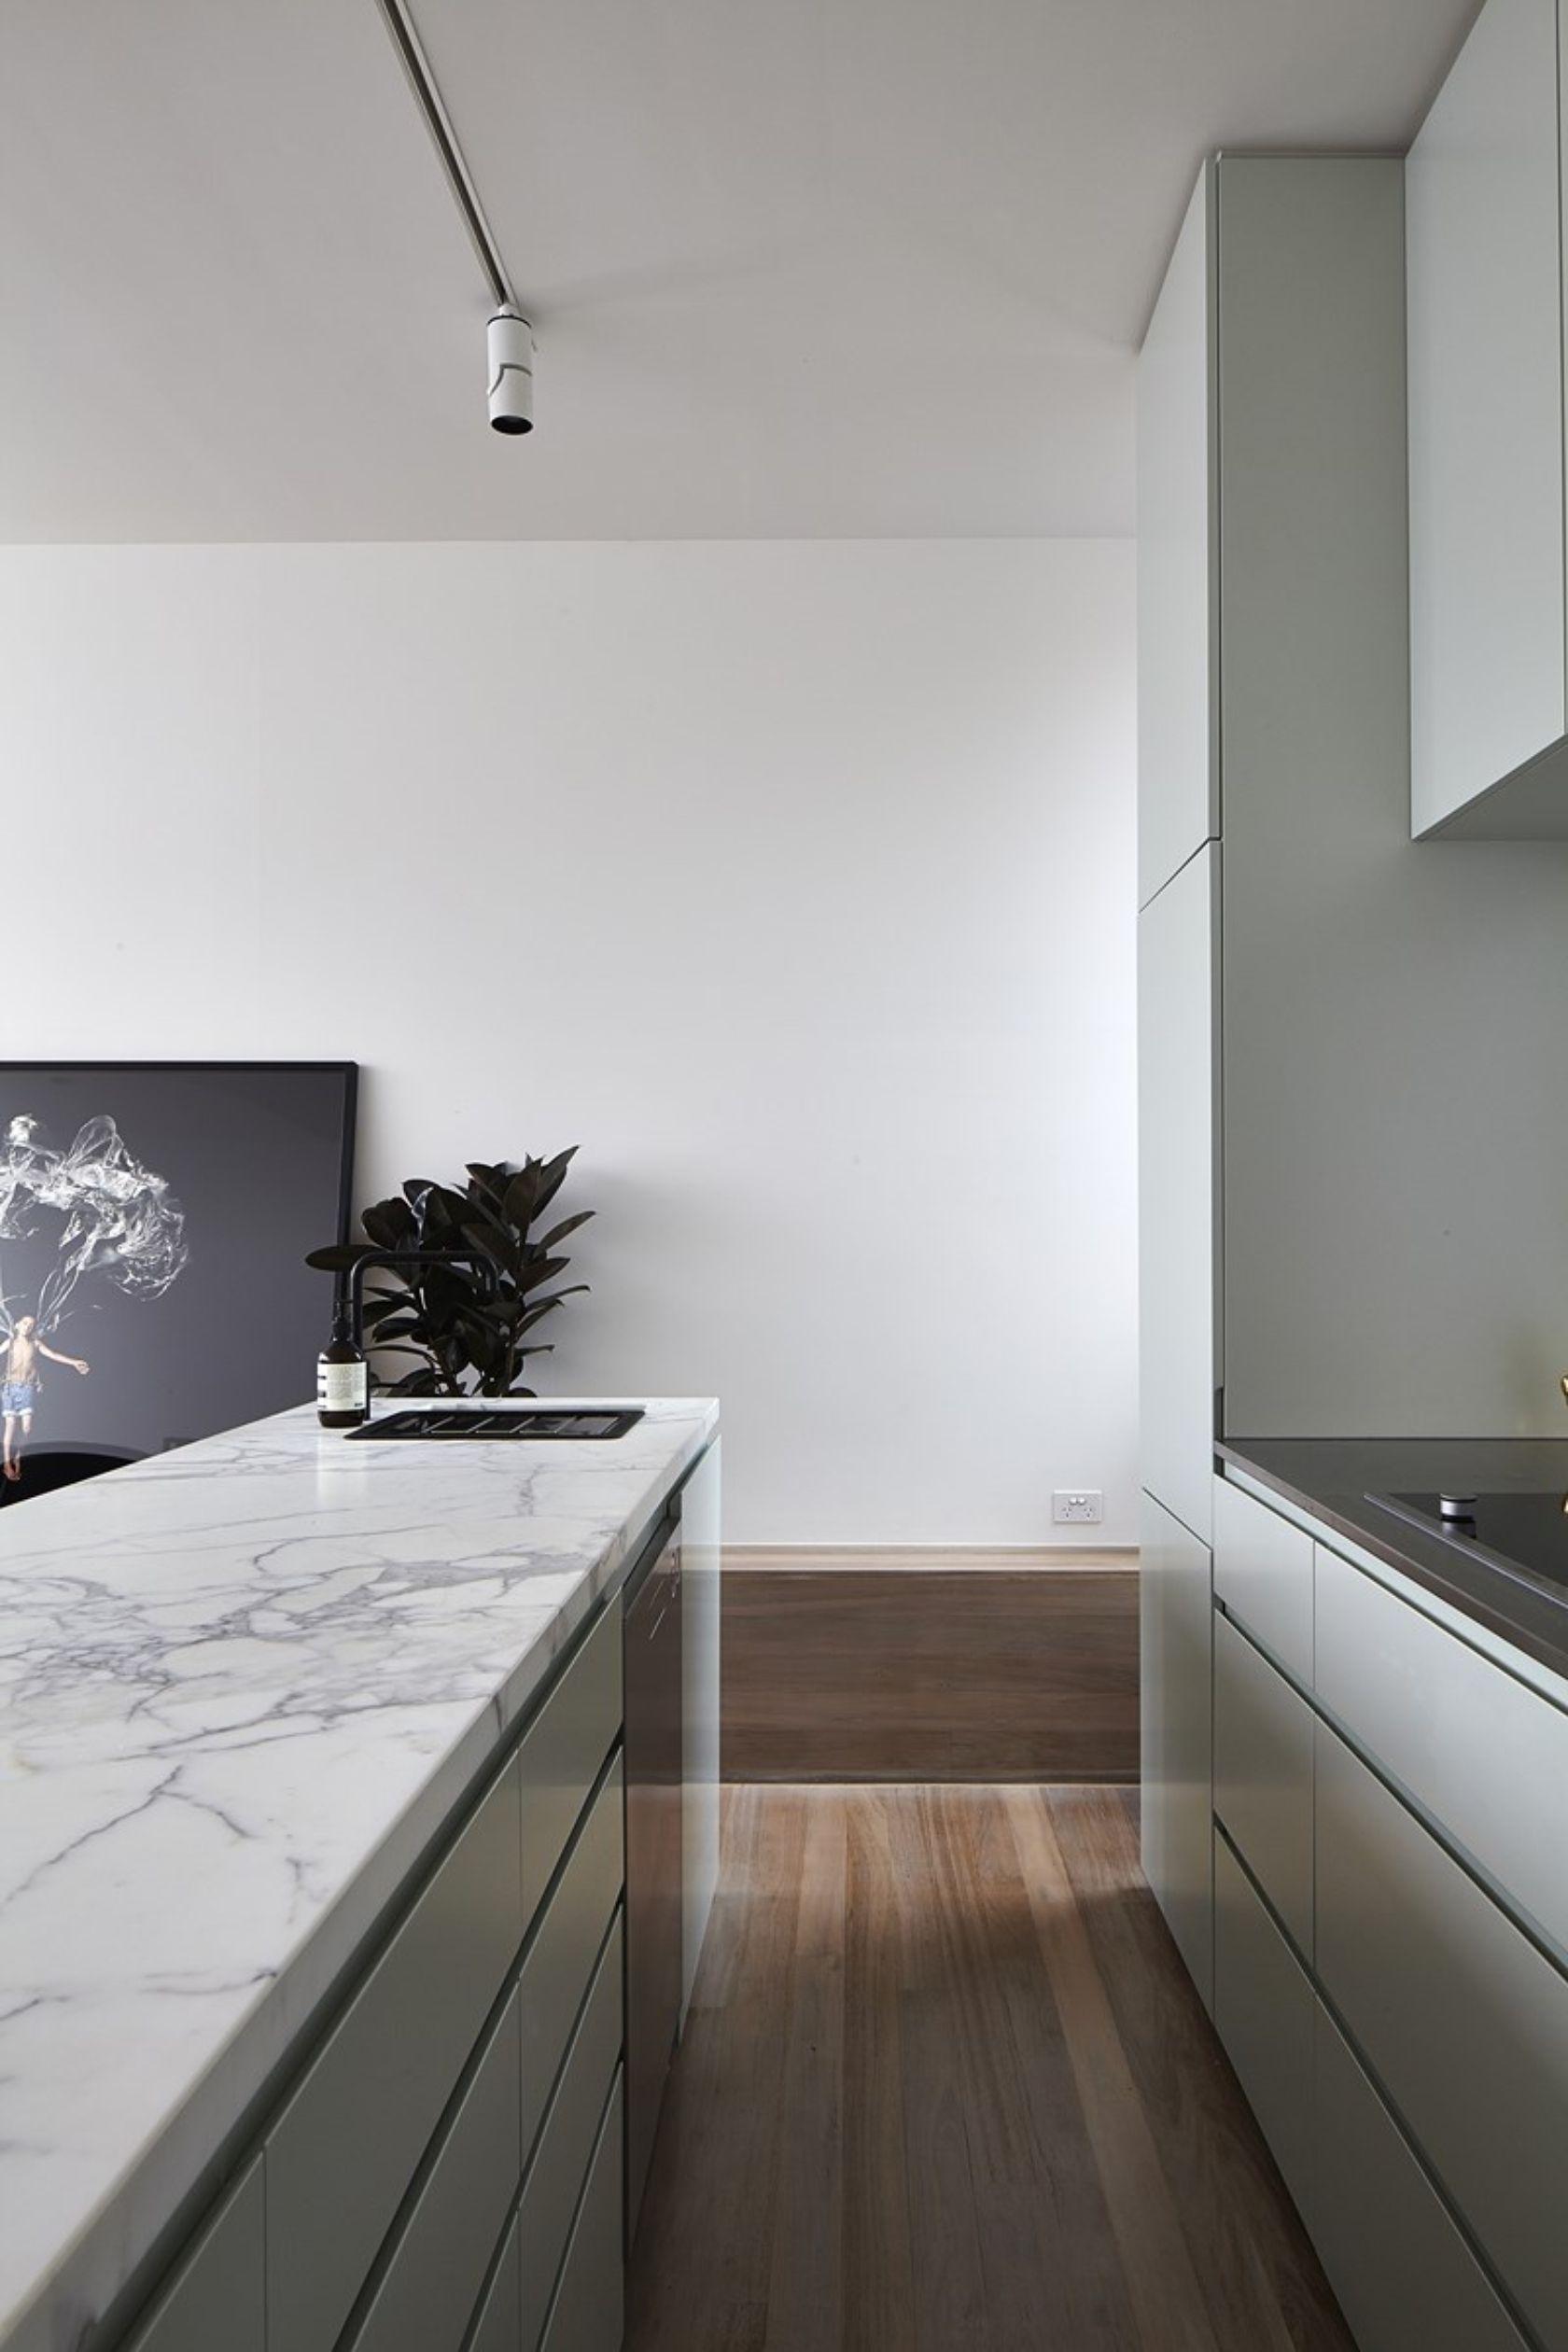 Lightbox house location melbourne australia firm for Minimalismus hausbau